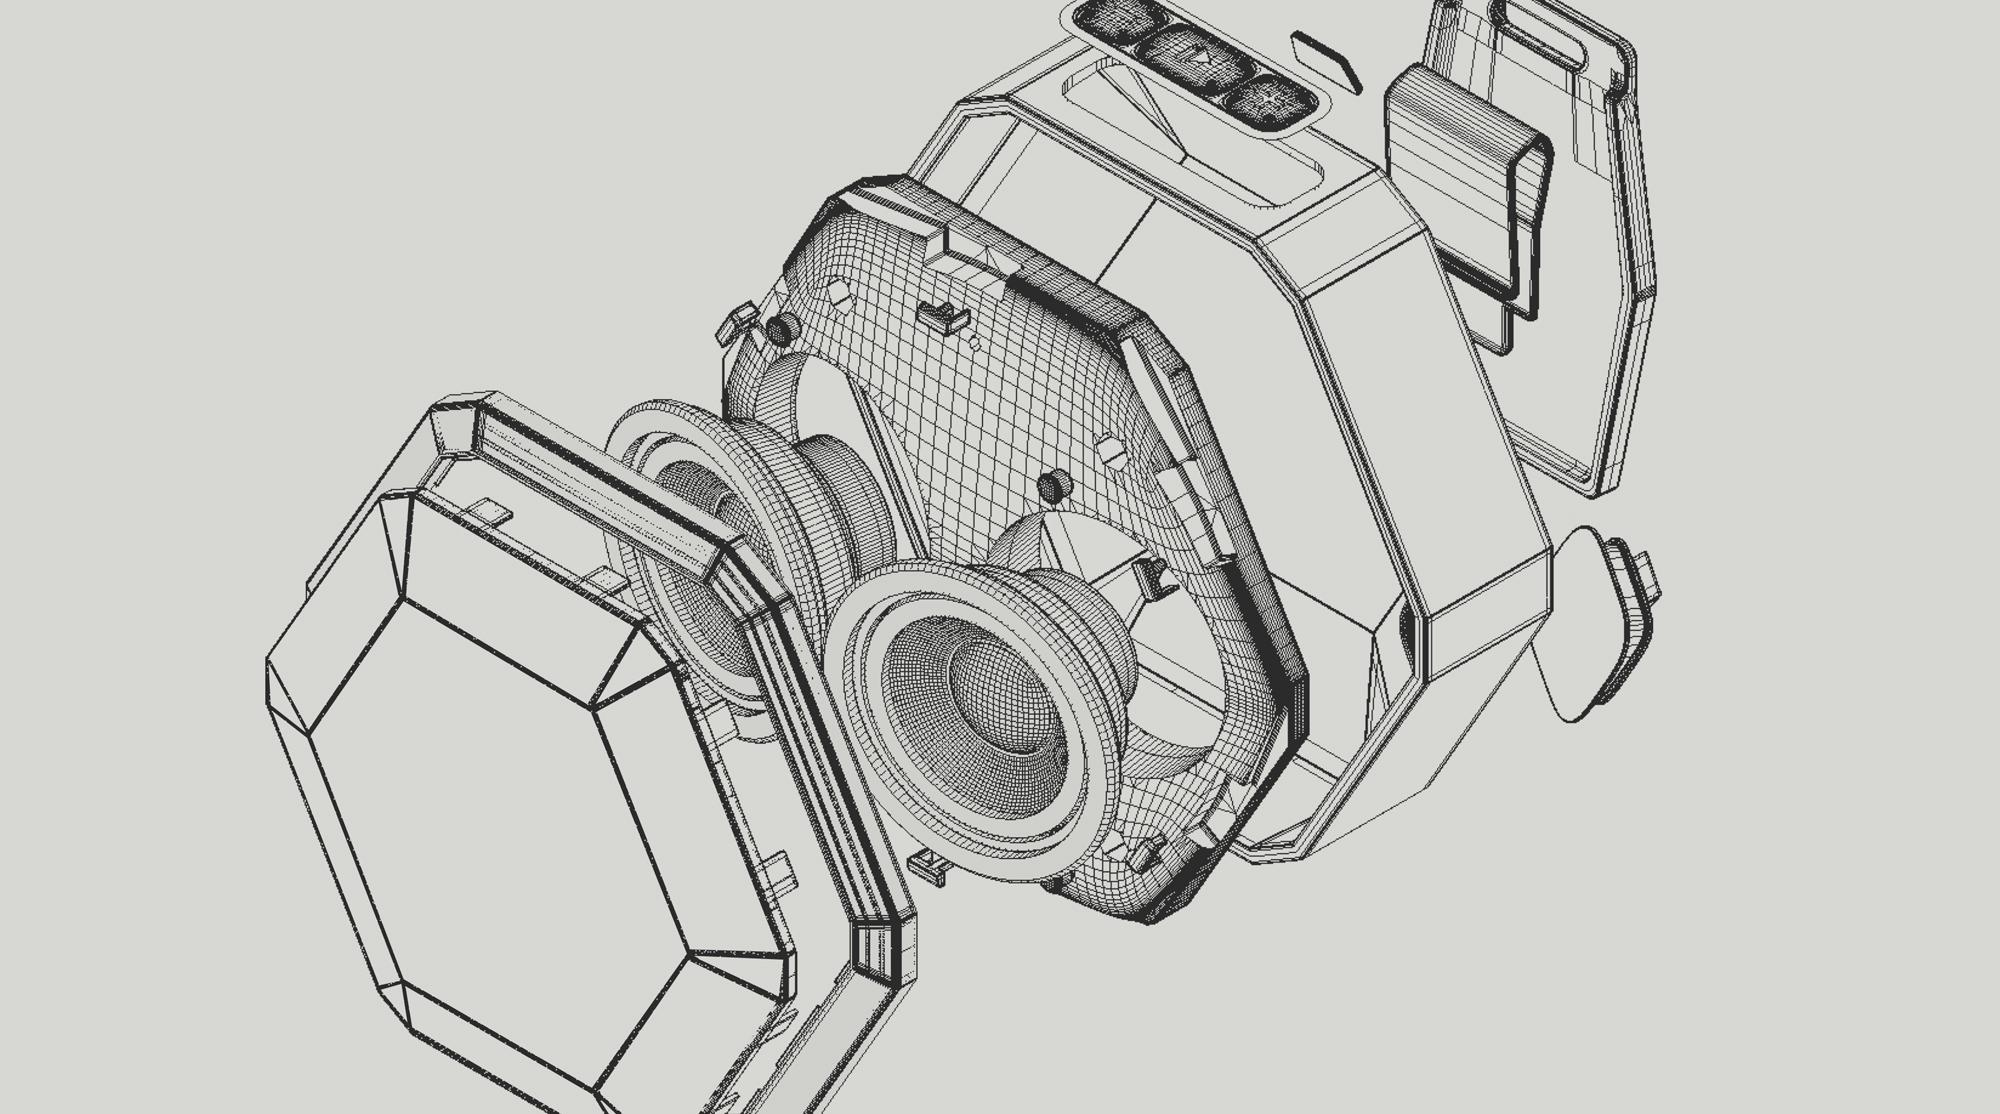 Boombotix engineering illustration of speaker